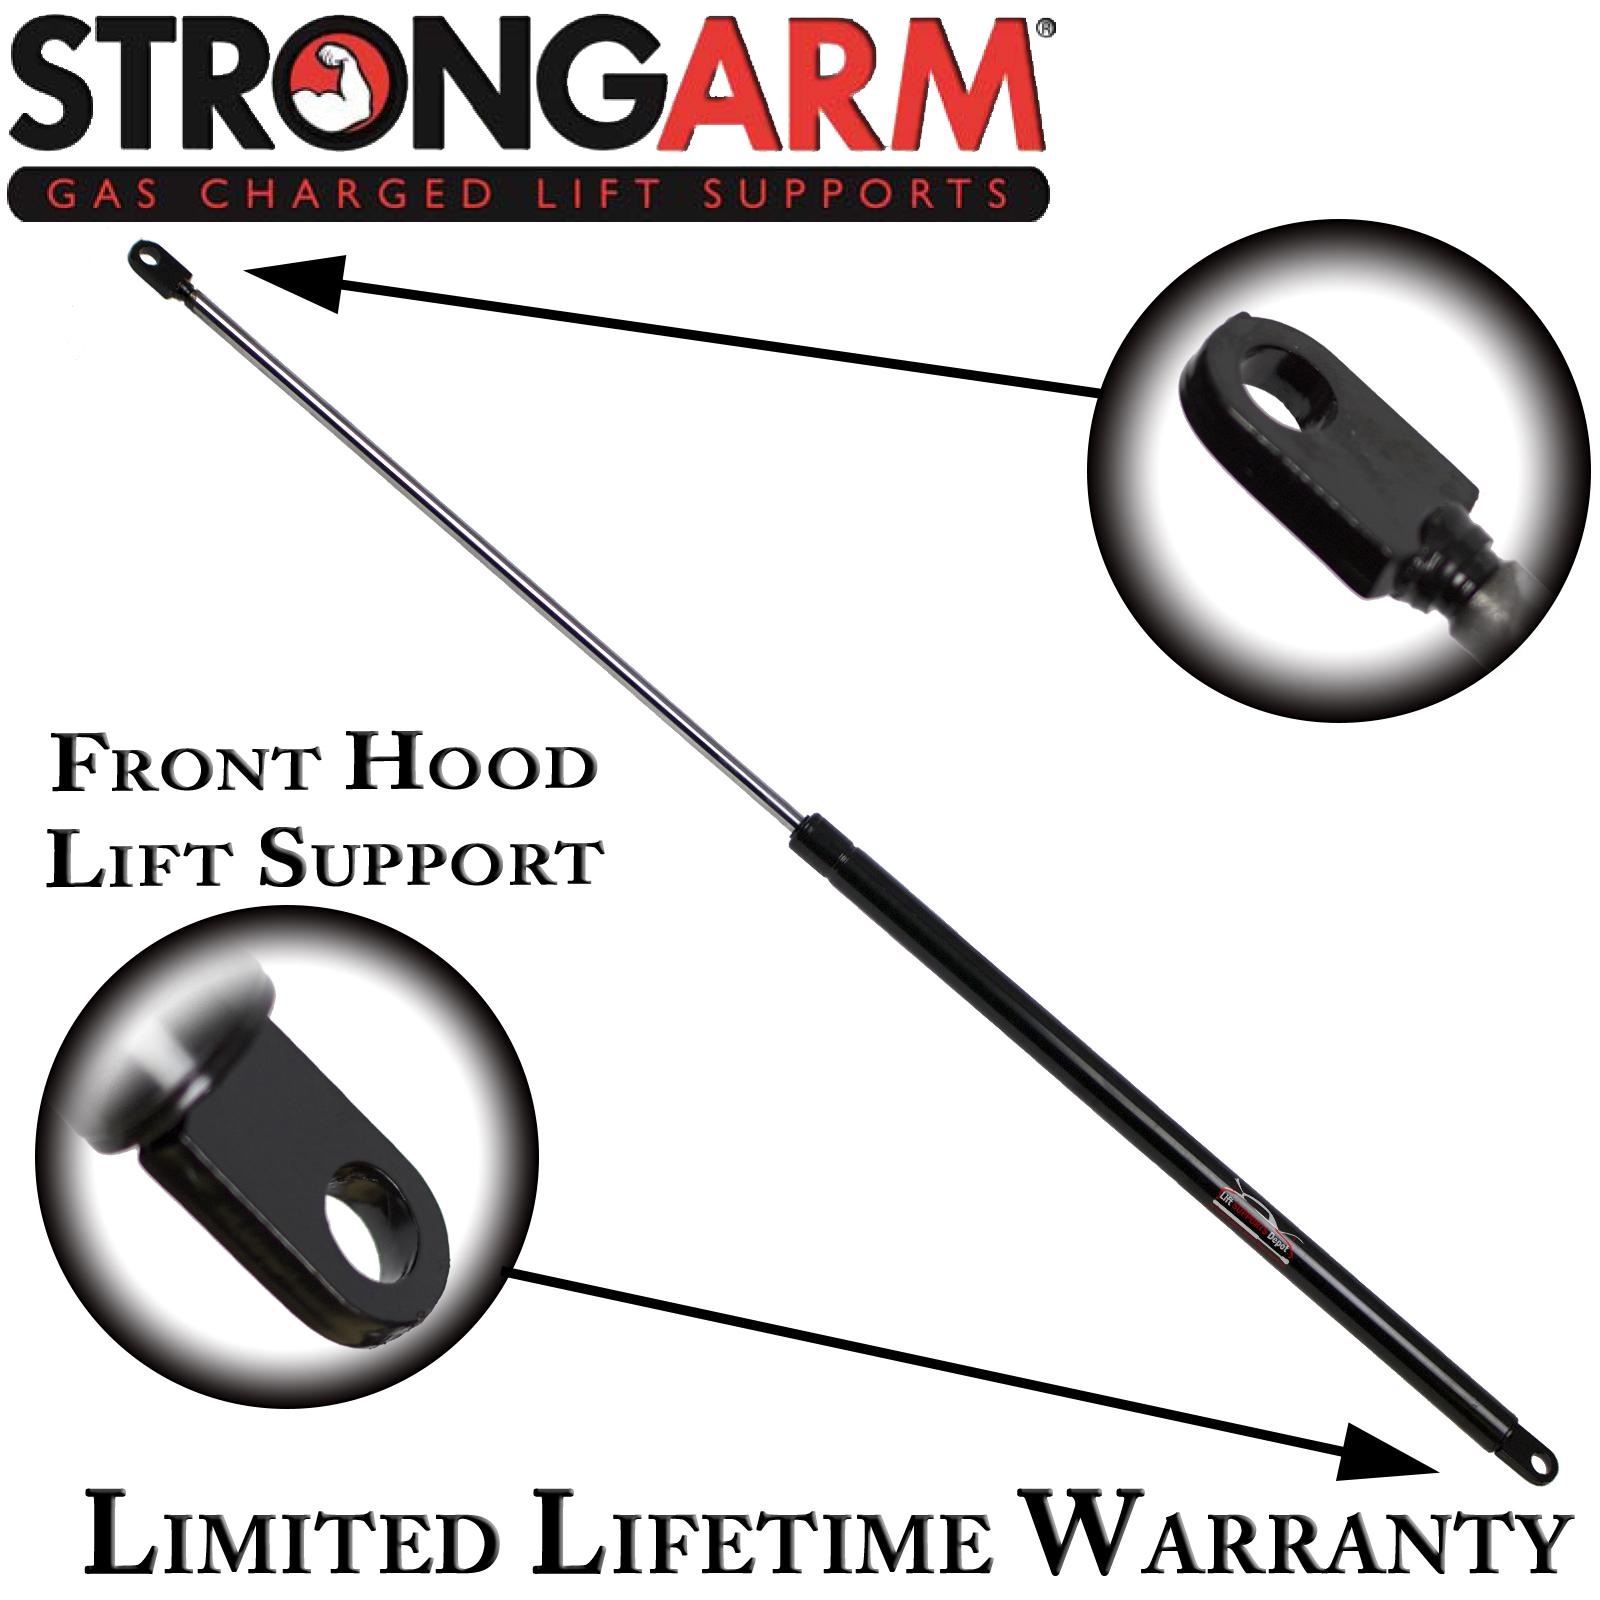 StrongArm 4687 Hood Lift Support